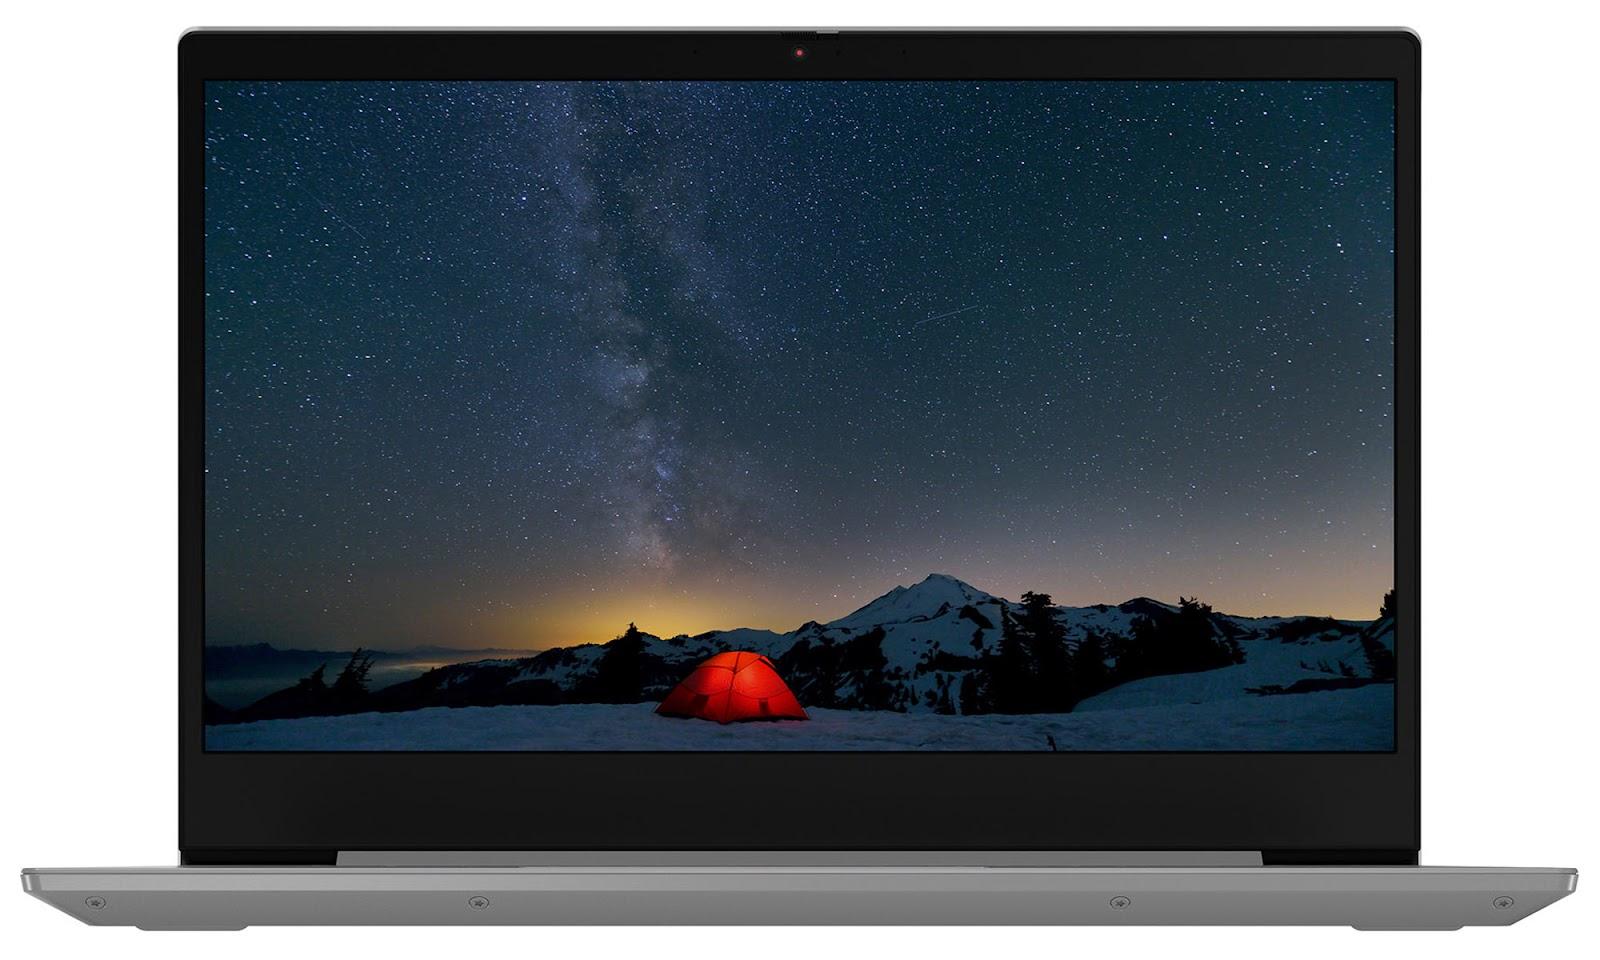 Фото 1. Ноутбук Lenovo ThinkBook 14 IIL (20SL0032RU)